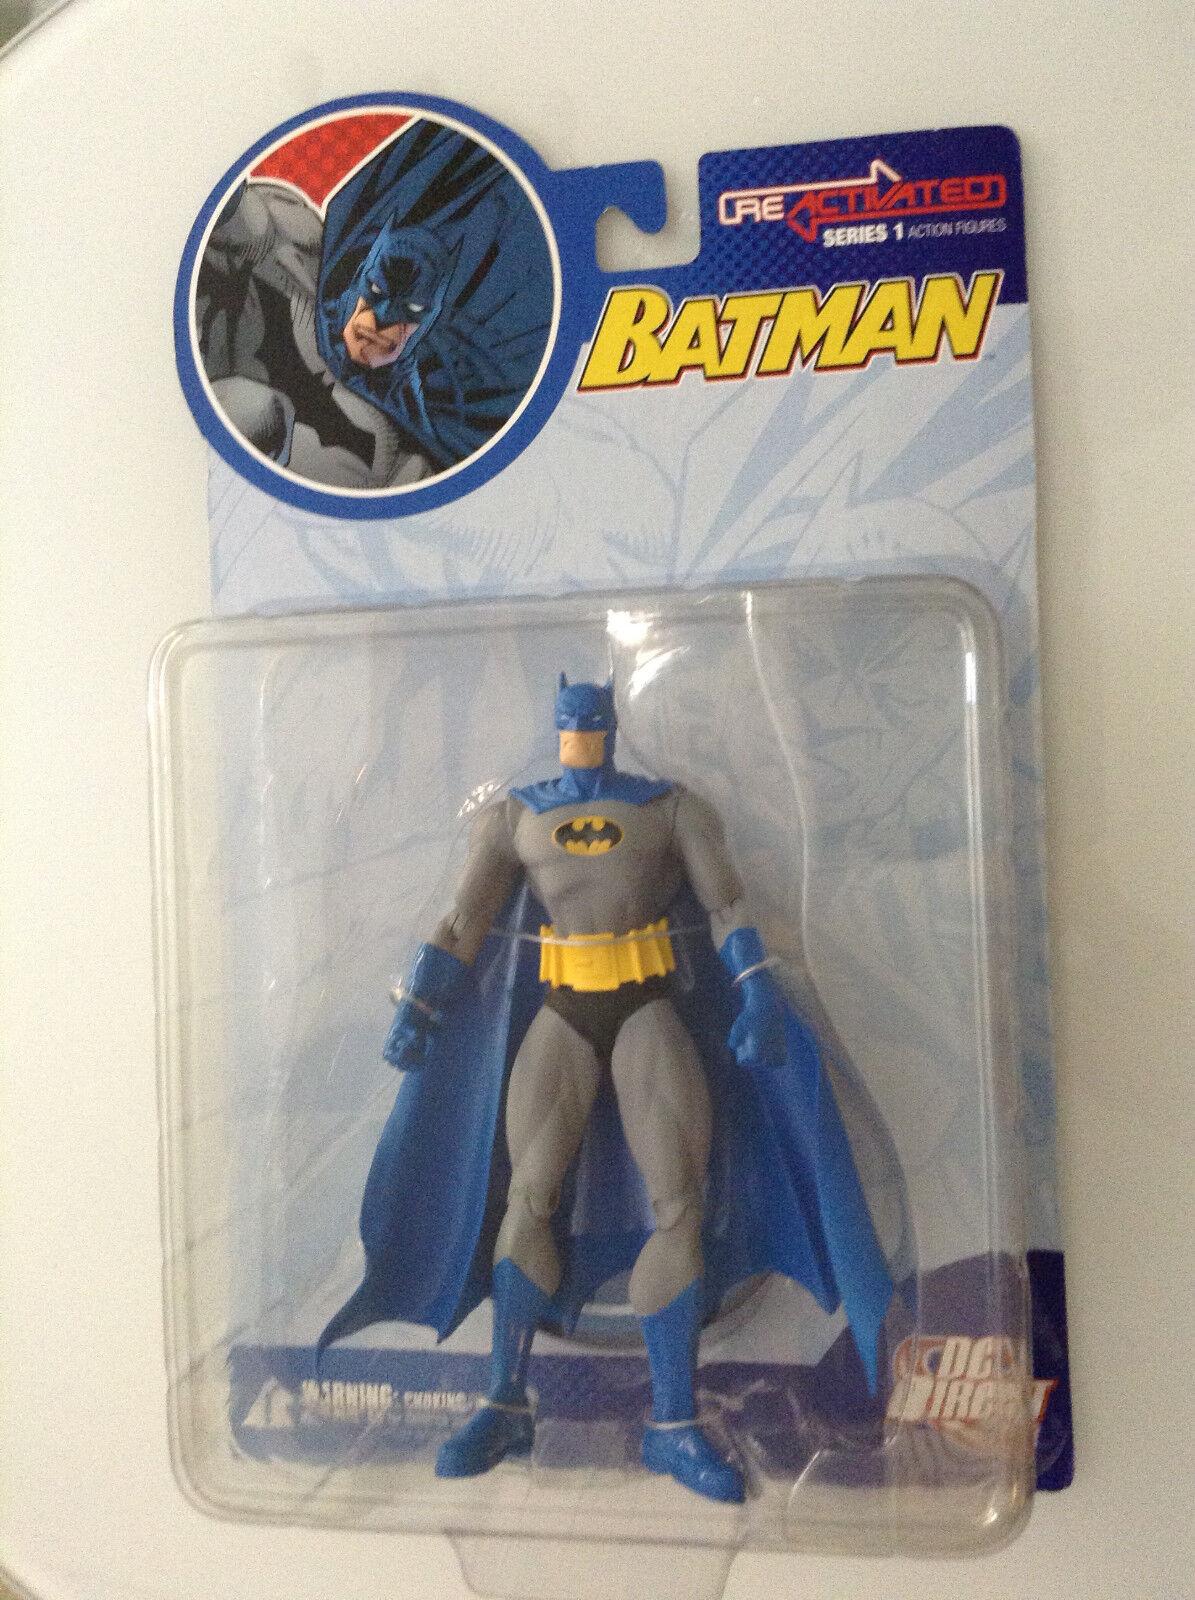 DC REACTIVATED SERIES 1 BATMAN FIGURE DC DC DC DIRECT RARE MIC NEW(CLASSIC 52 REBIRTH de8093